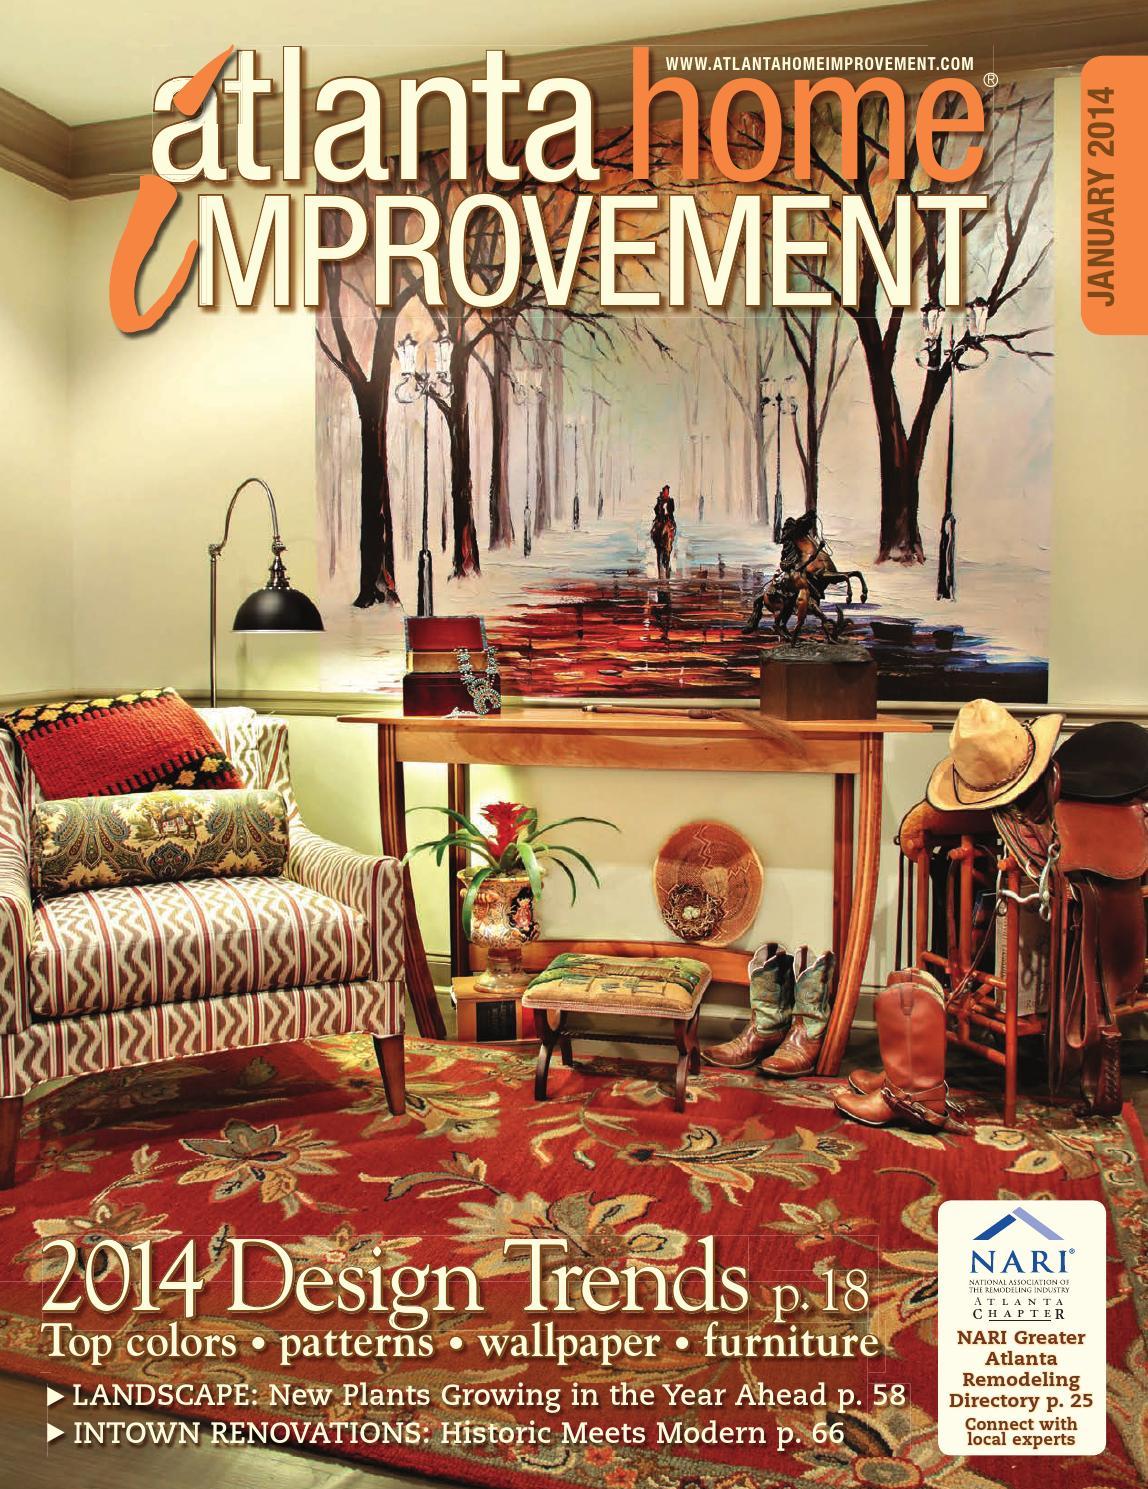 10x10 Grow Room Design: Atlanta Home Improvement 0114 By My Home Improvement